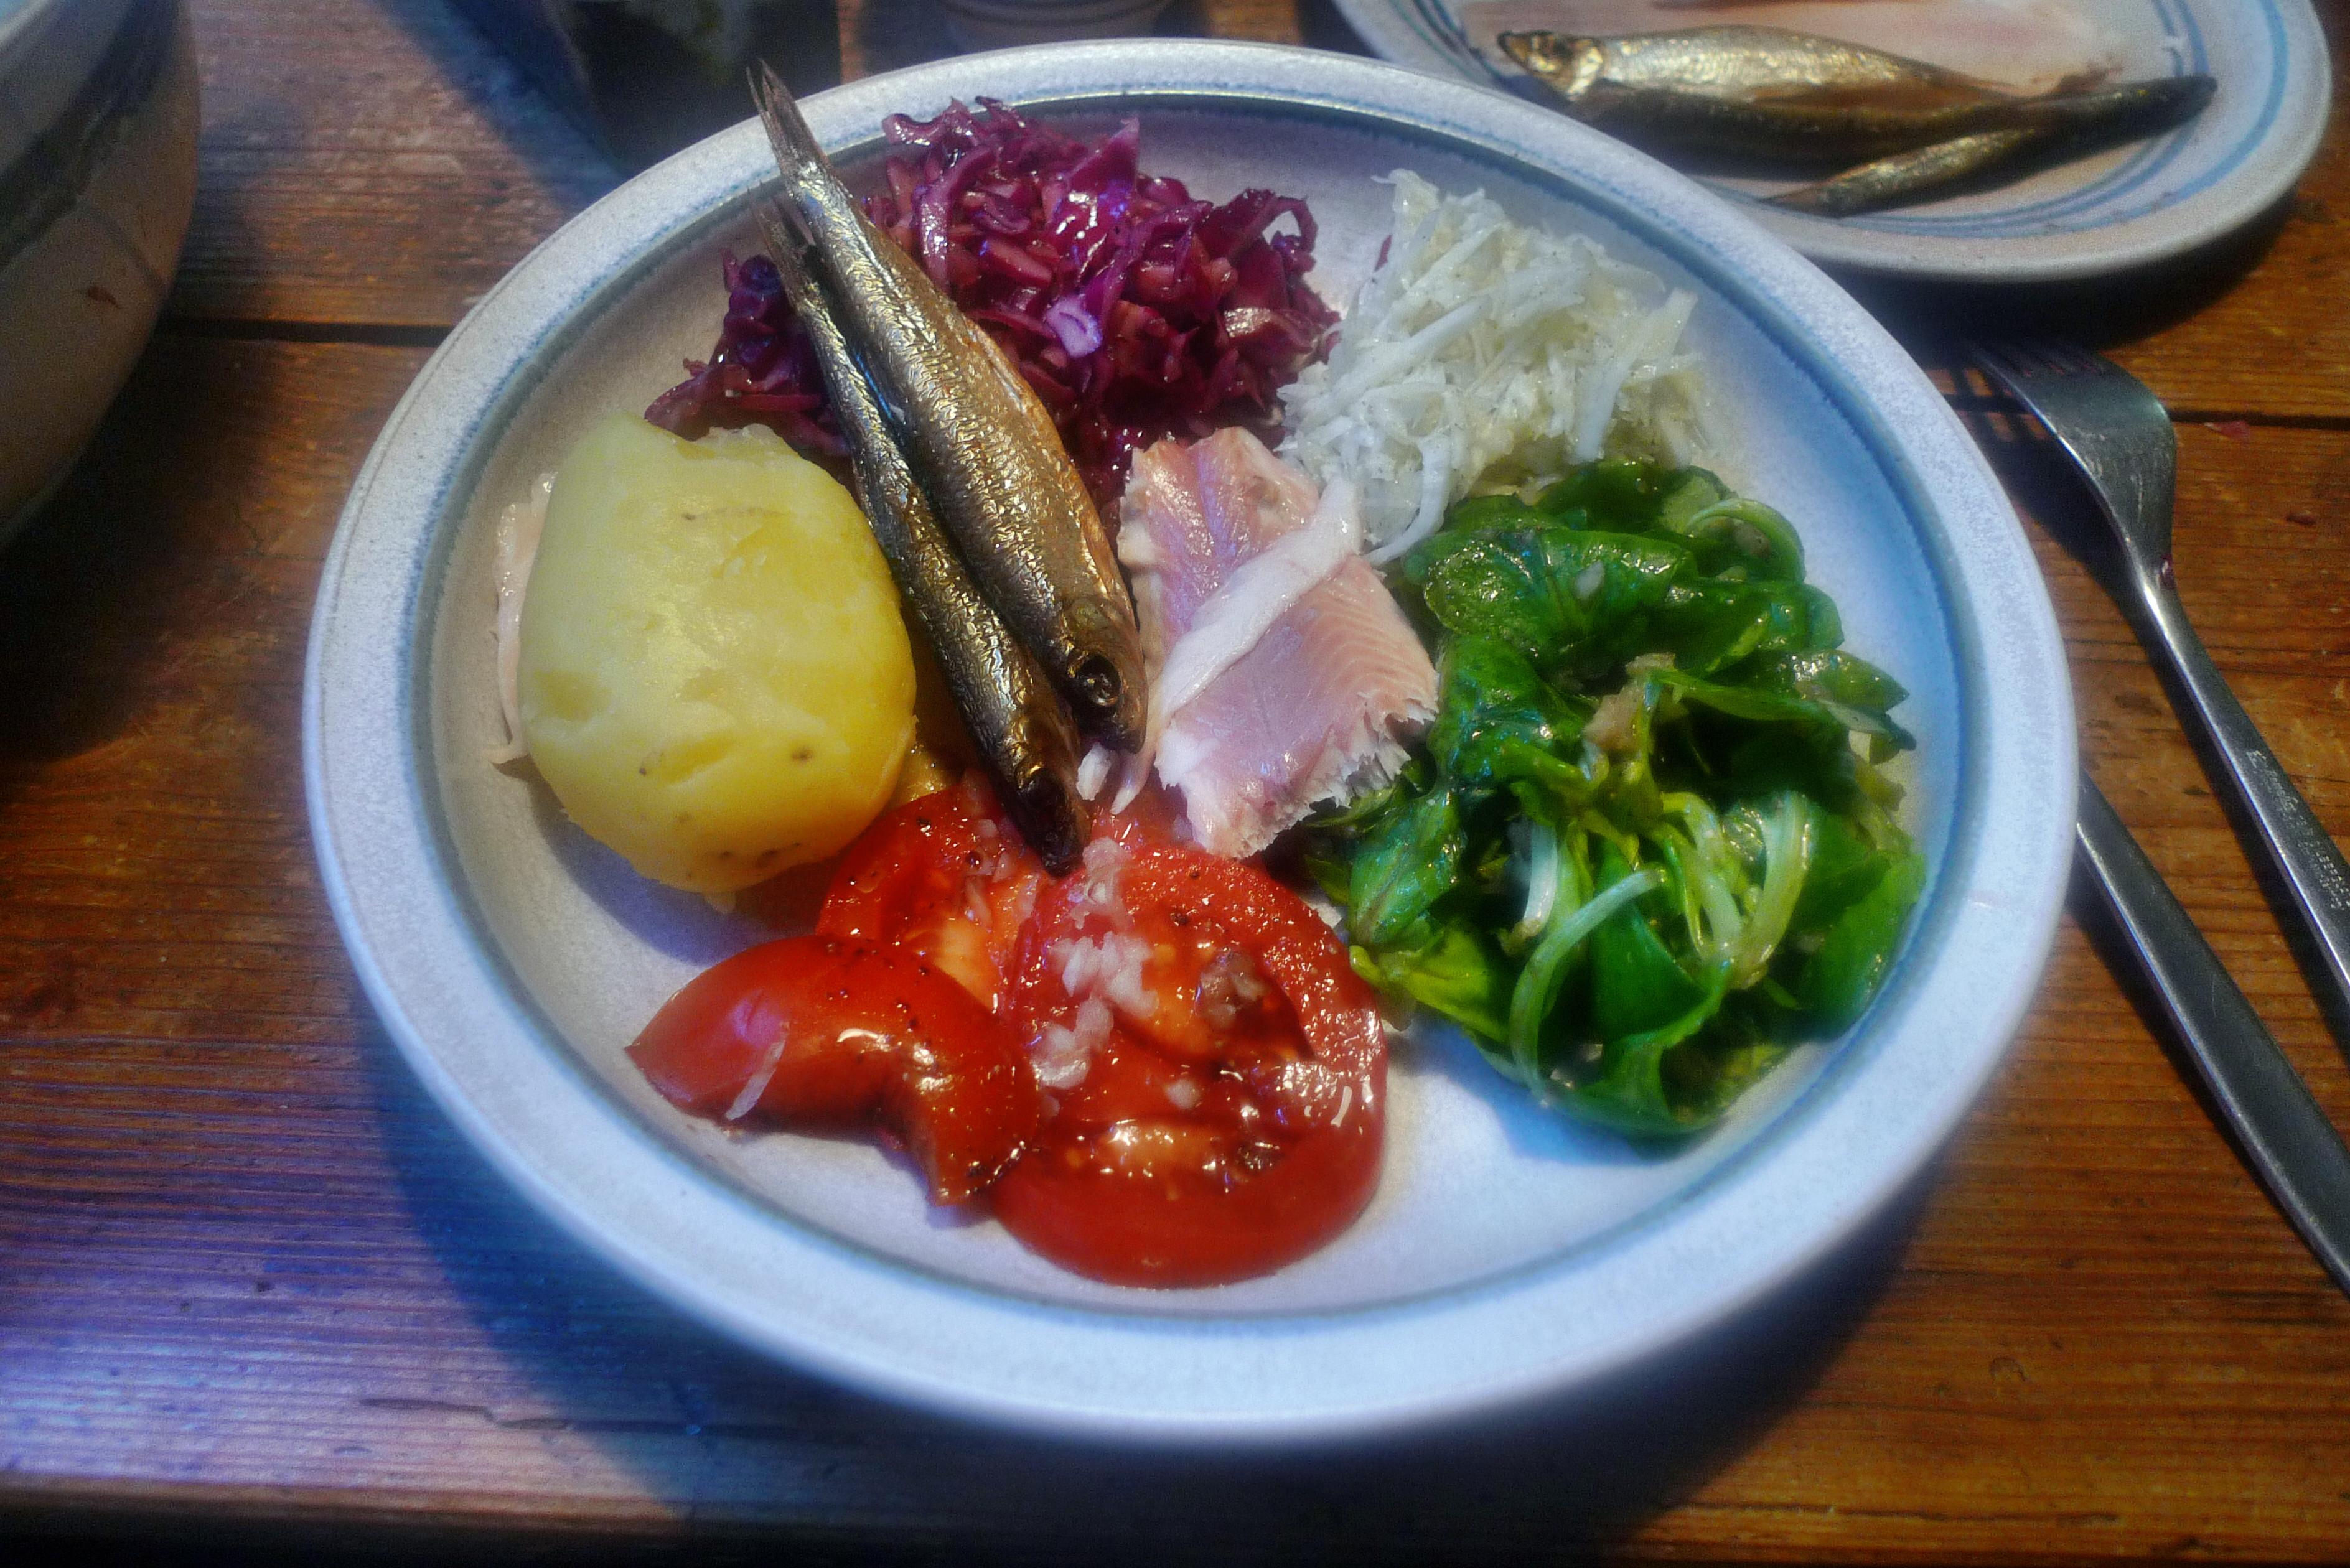 Foewllw-Salate-Kartoffeln-24.10-14   (9)